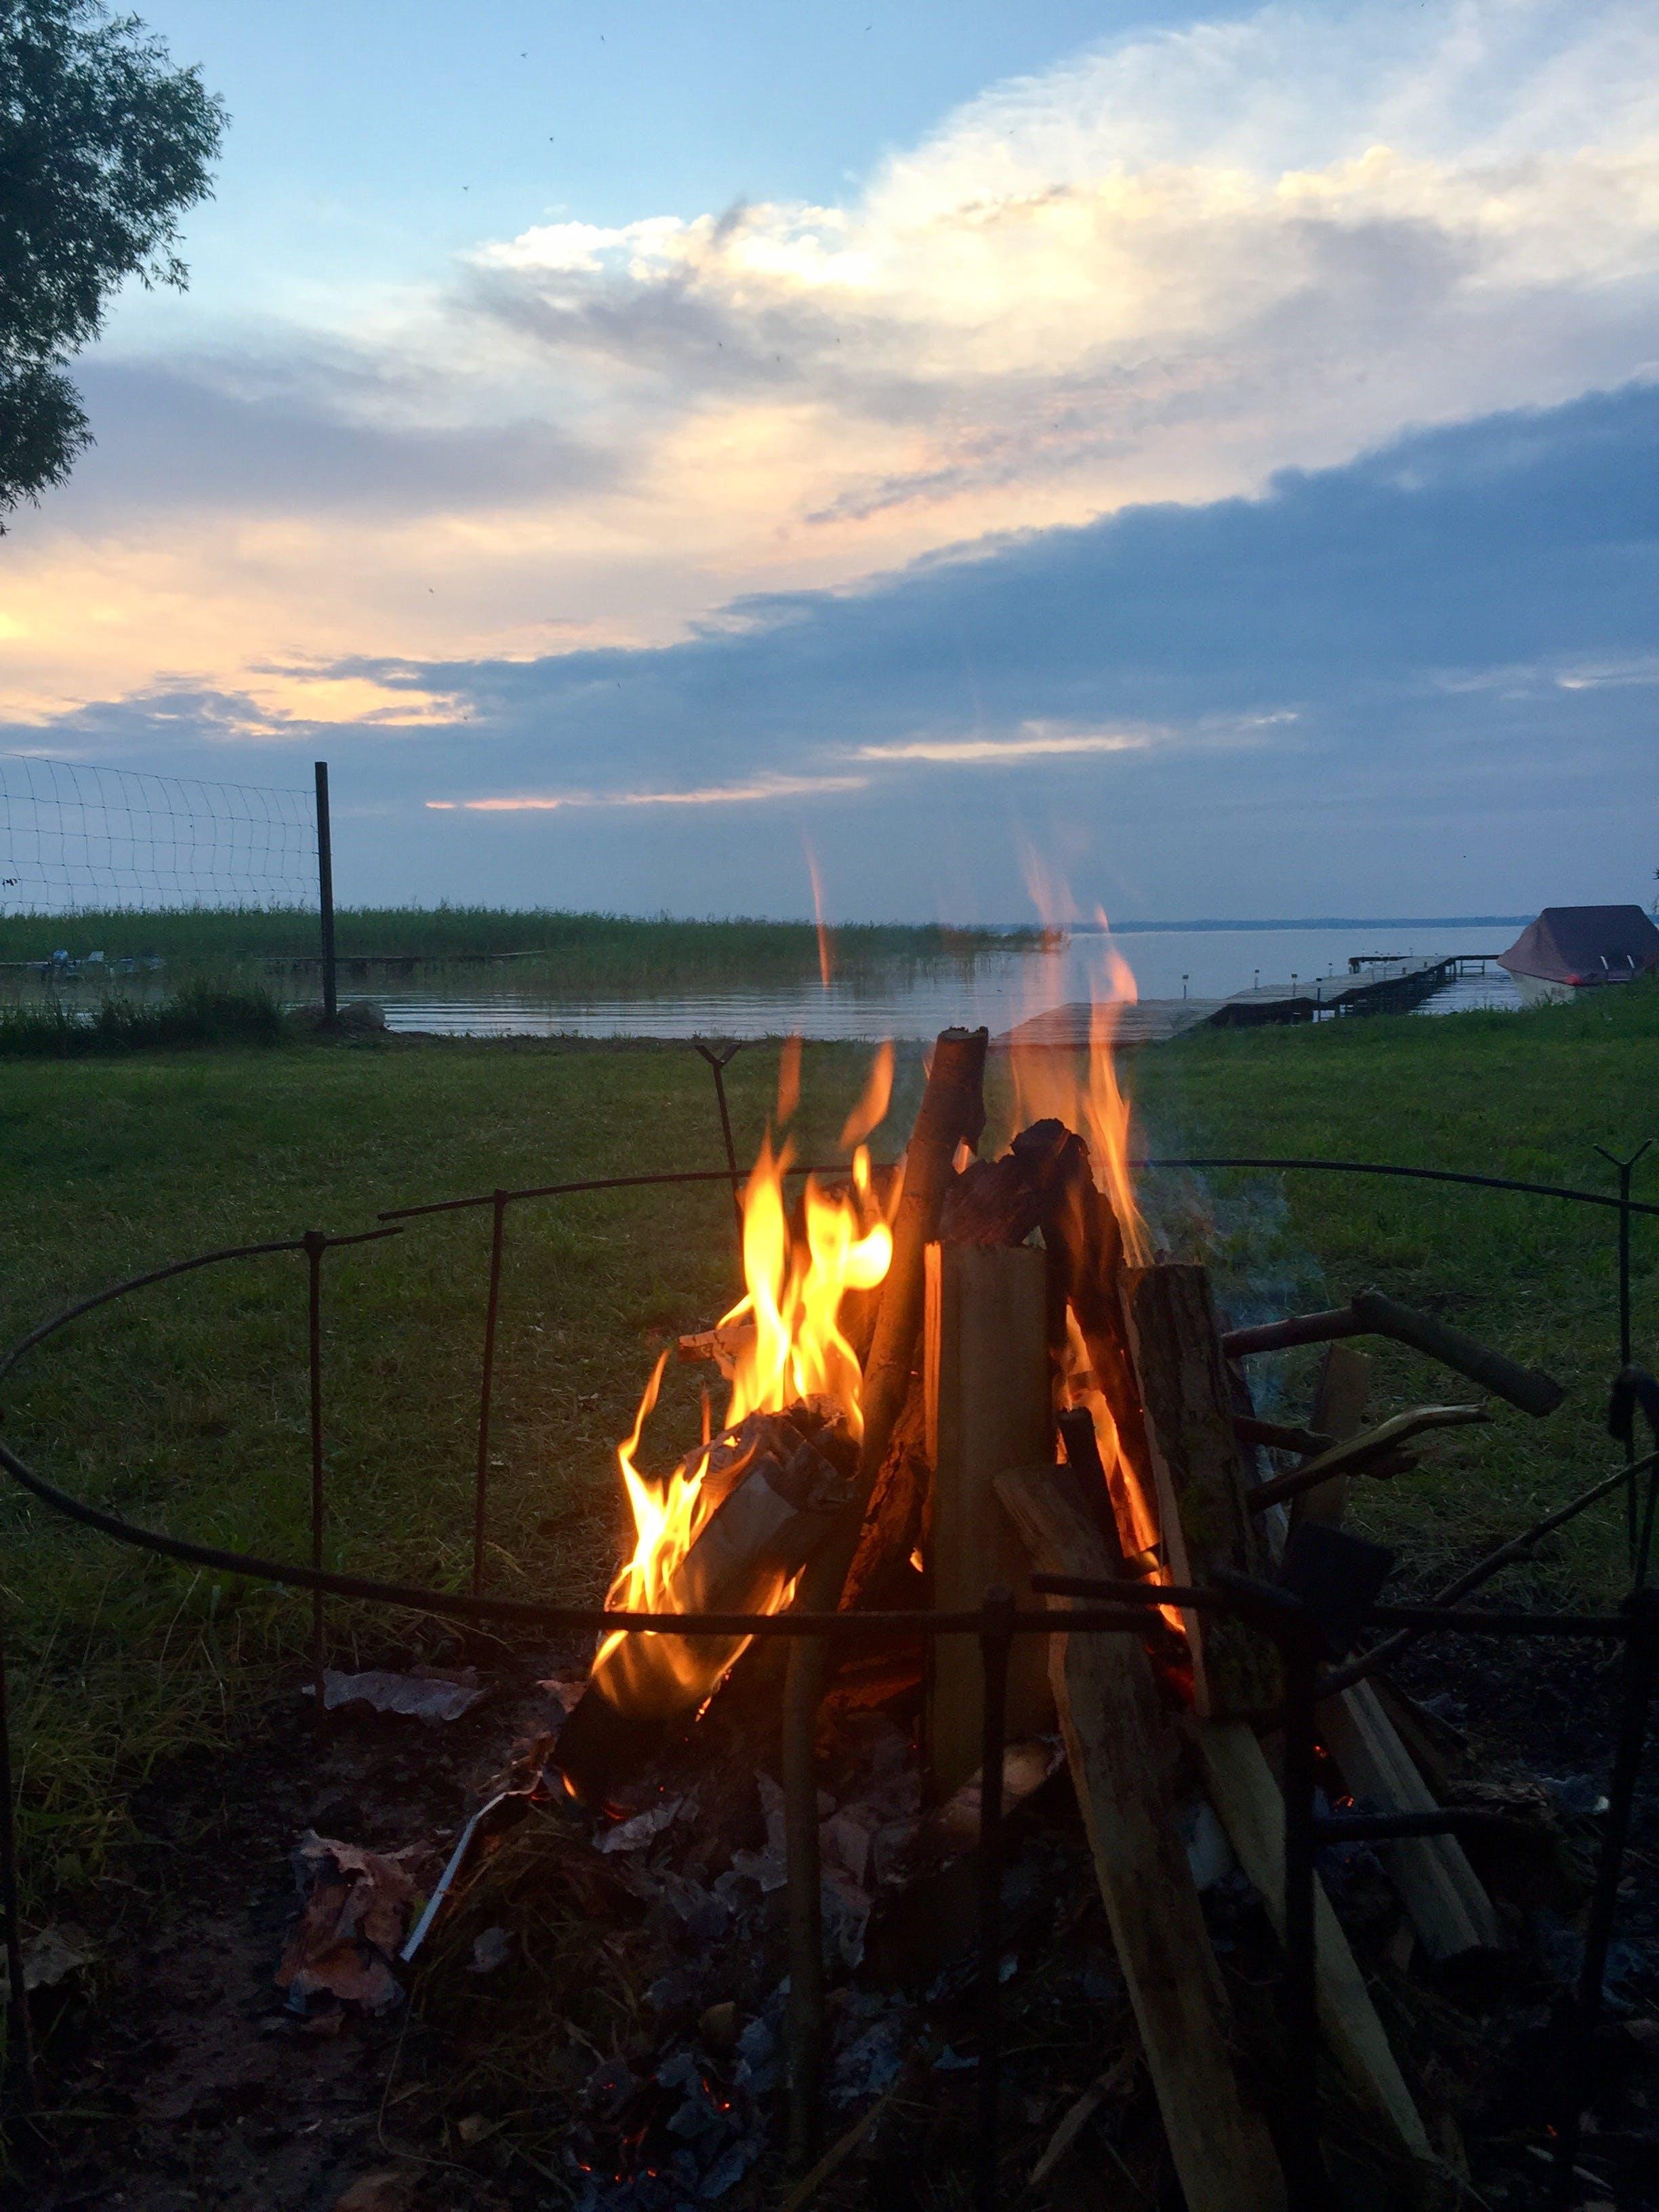 Free stock photo of bonfire, campfire, empty, lake